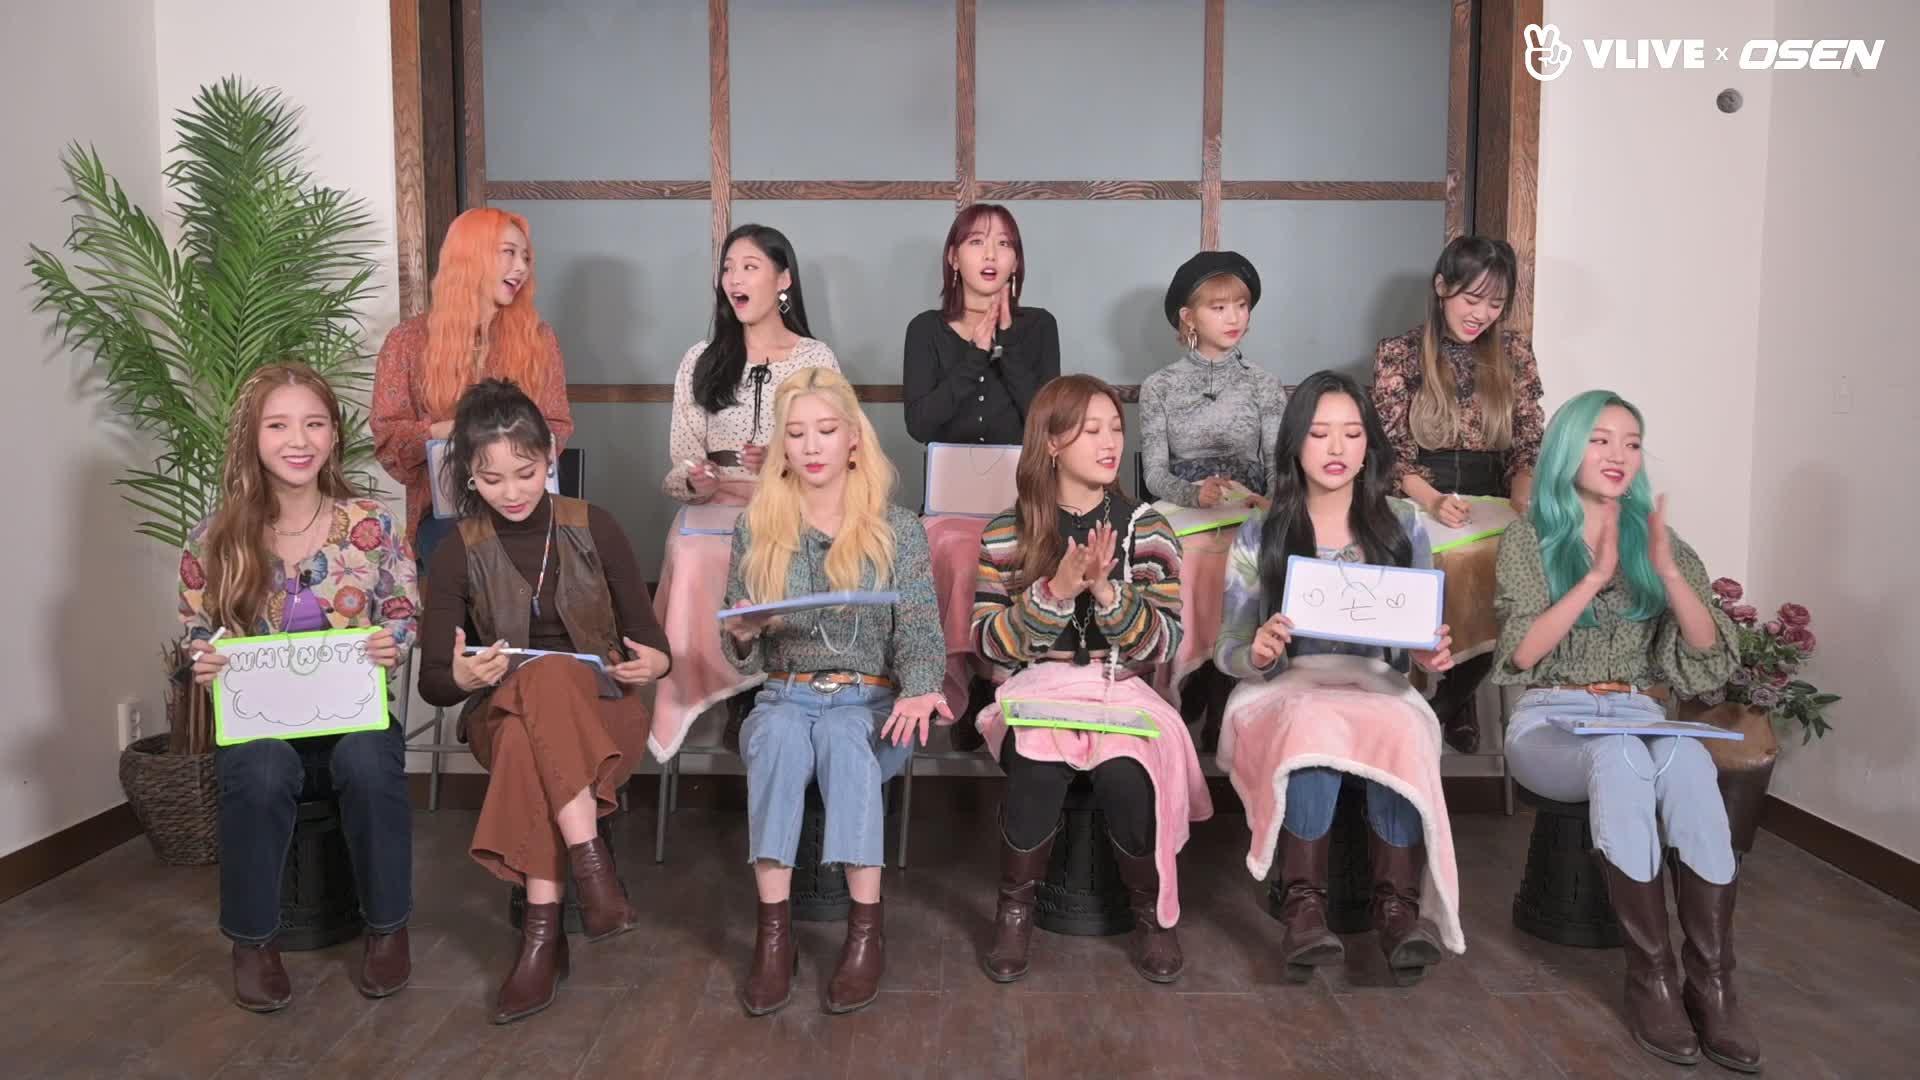 [OSEN] 이달의소녀, 무반주댄스x애창곡 벌칙의 주인공은? #스타로드 06